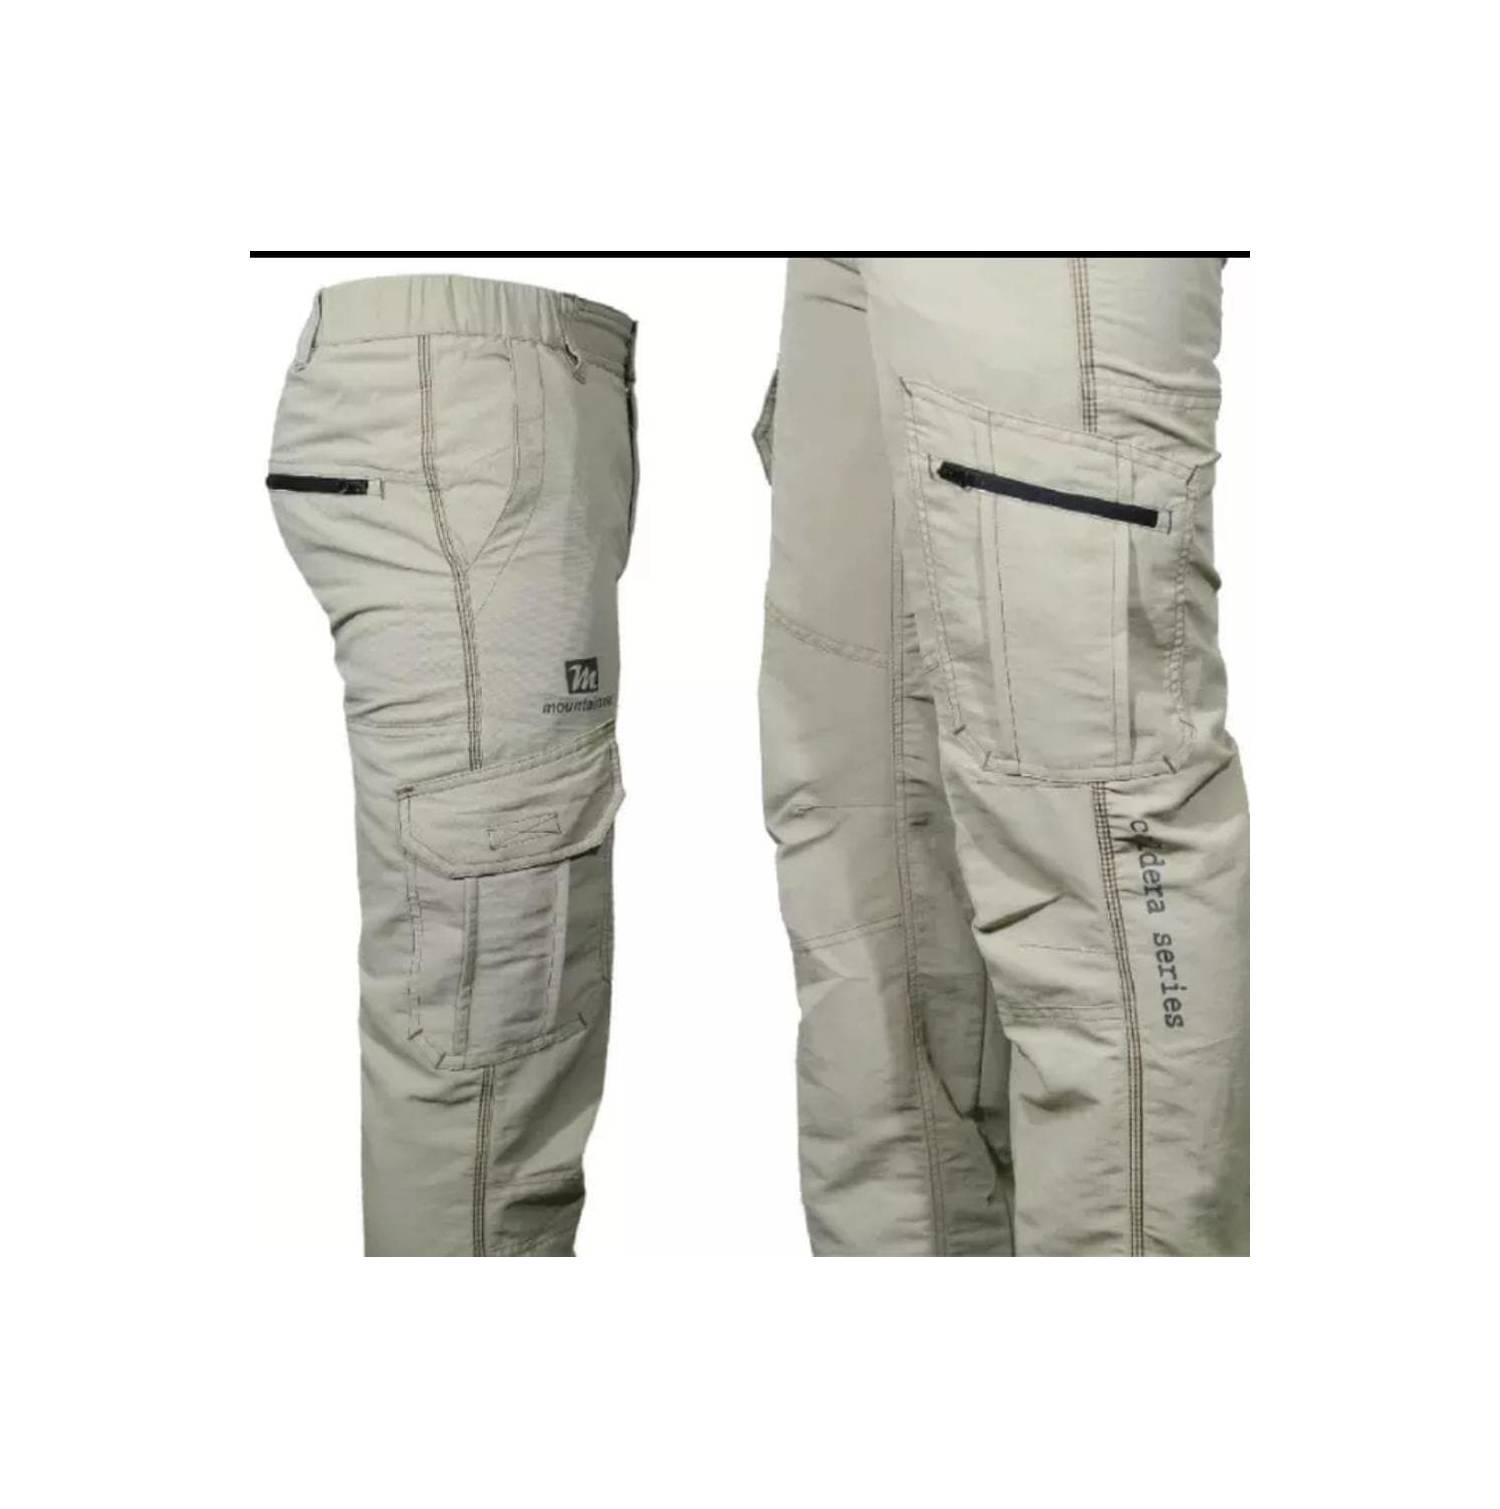 Celana Panjang Quickdry Hiking Outdoor Bukan Consina Eiger Avt Limited